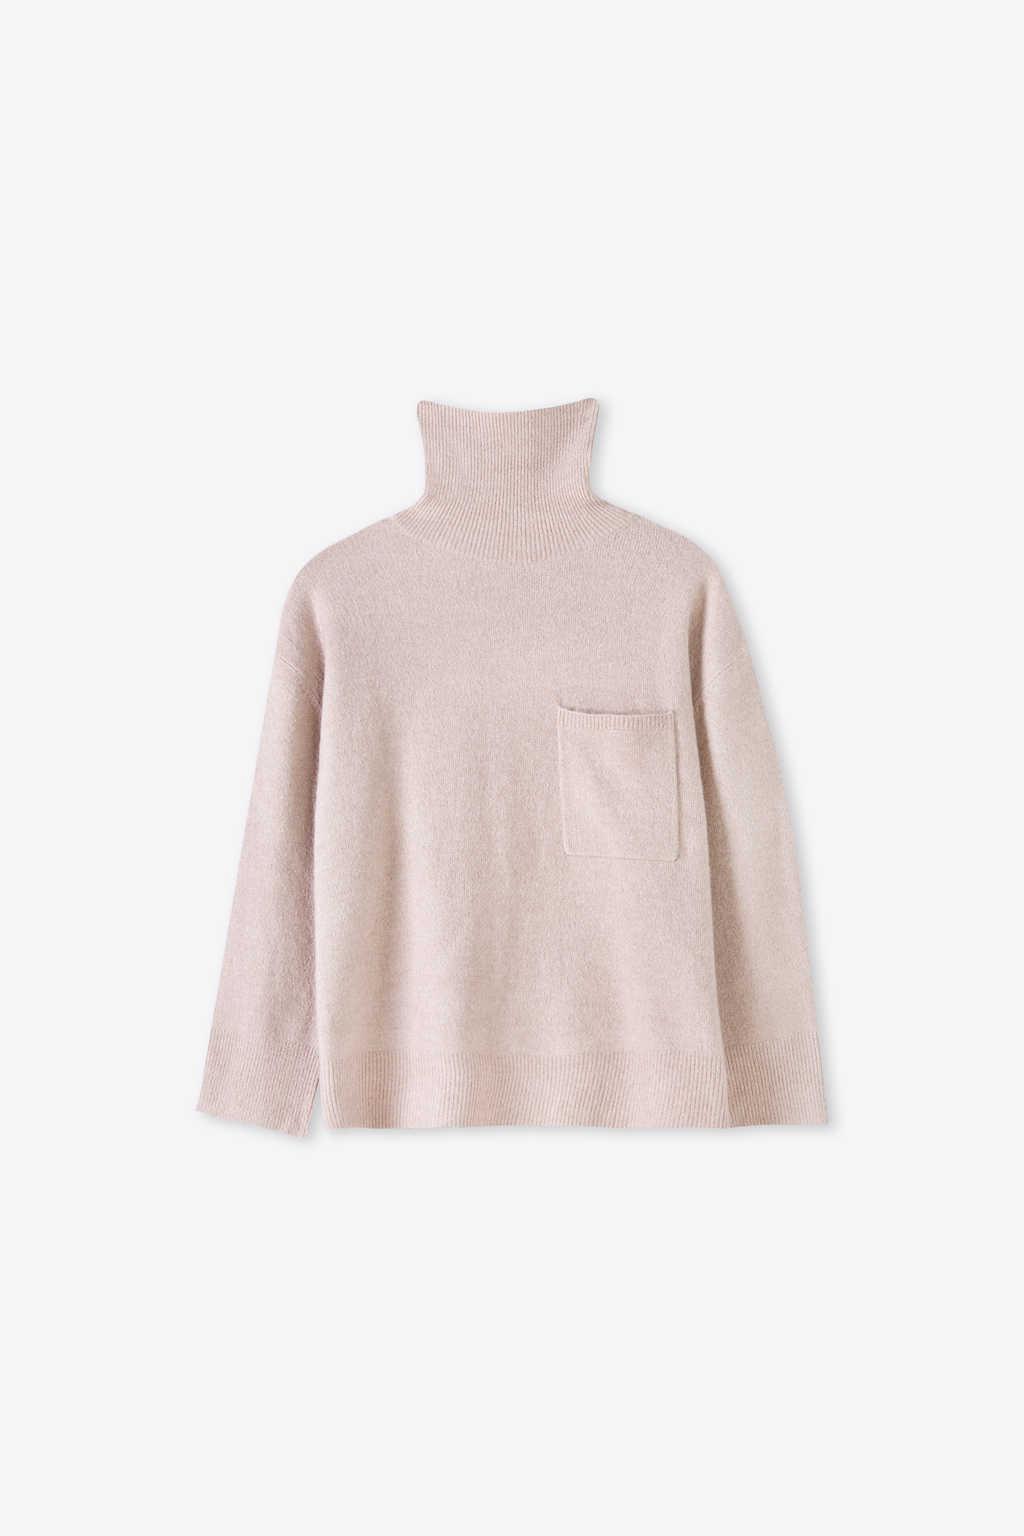 Sweater 2406 Oatmeal 10